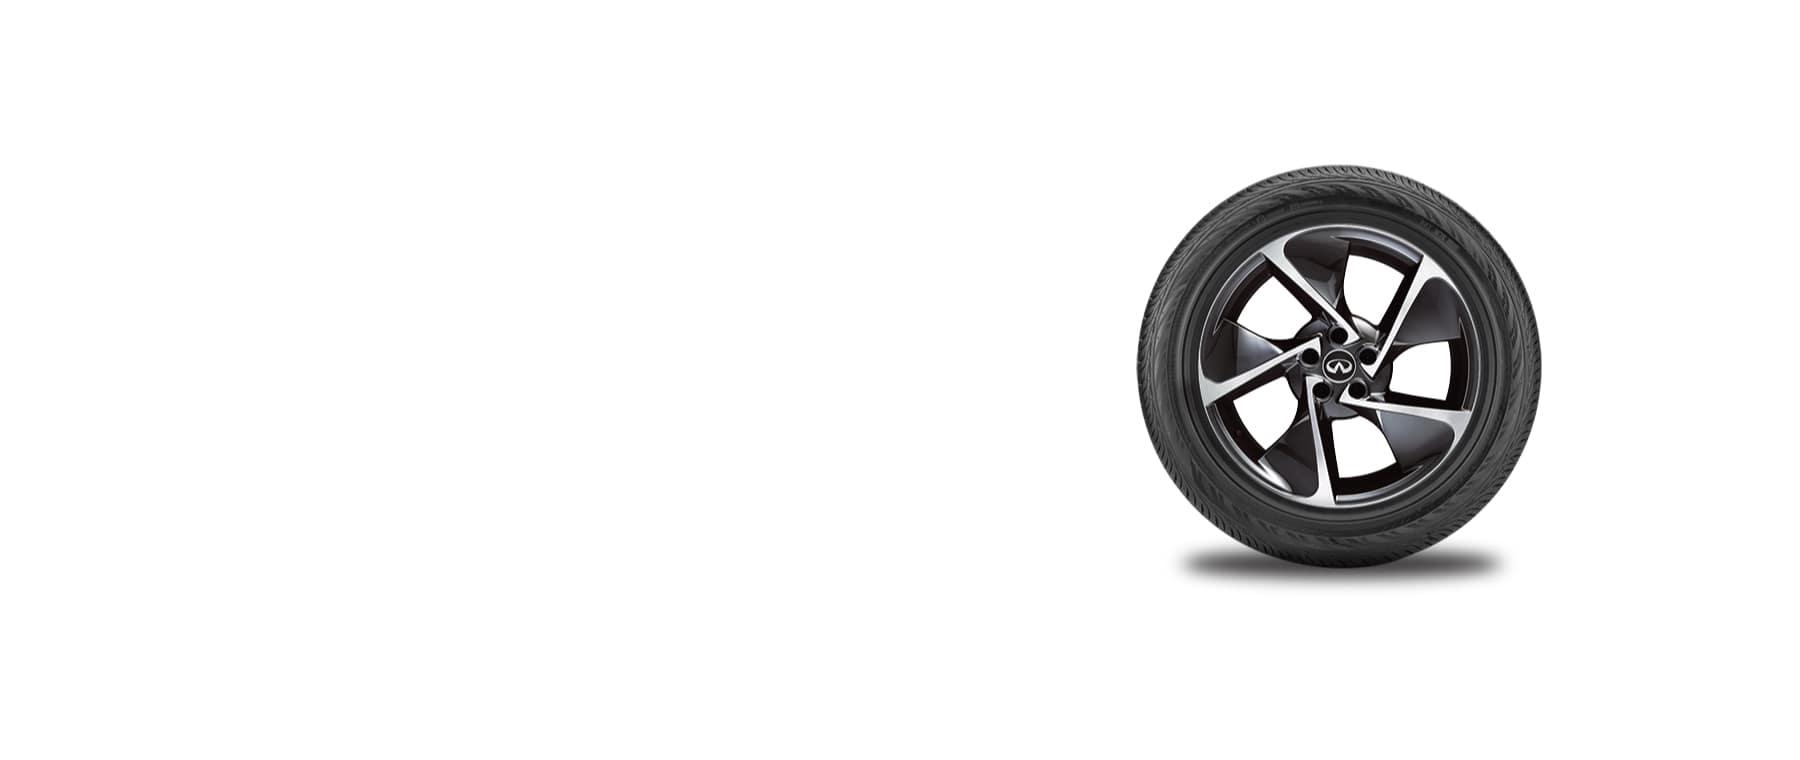 DES_INFINITI_PriceMatch_Wheel_72dpi_1800x760